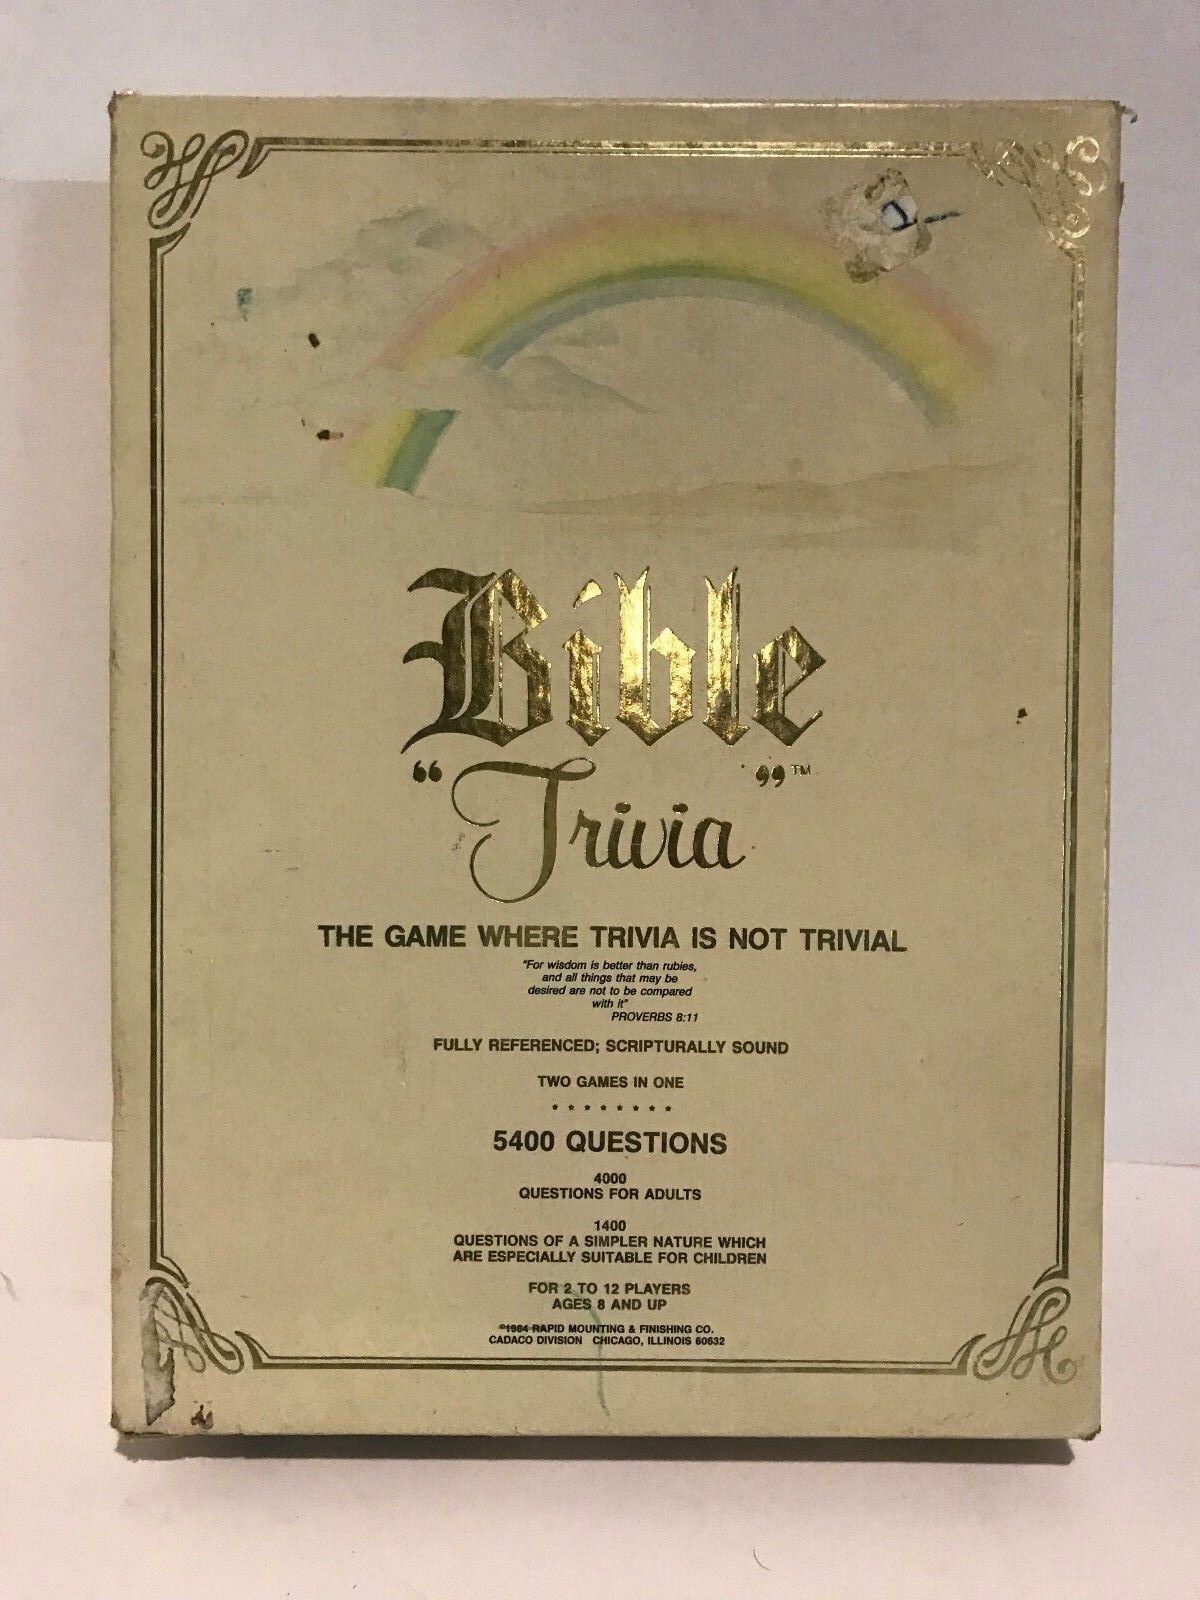 Bible Trivia Board Game 5400 Questions 1984 - Cadaco